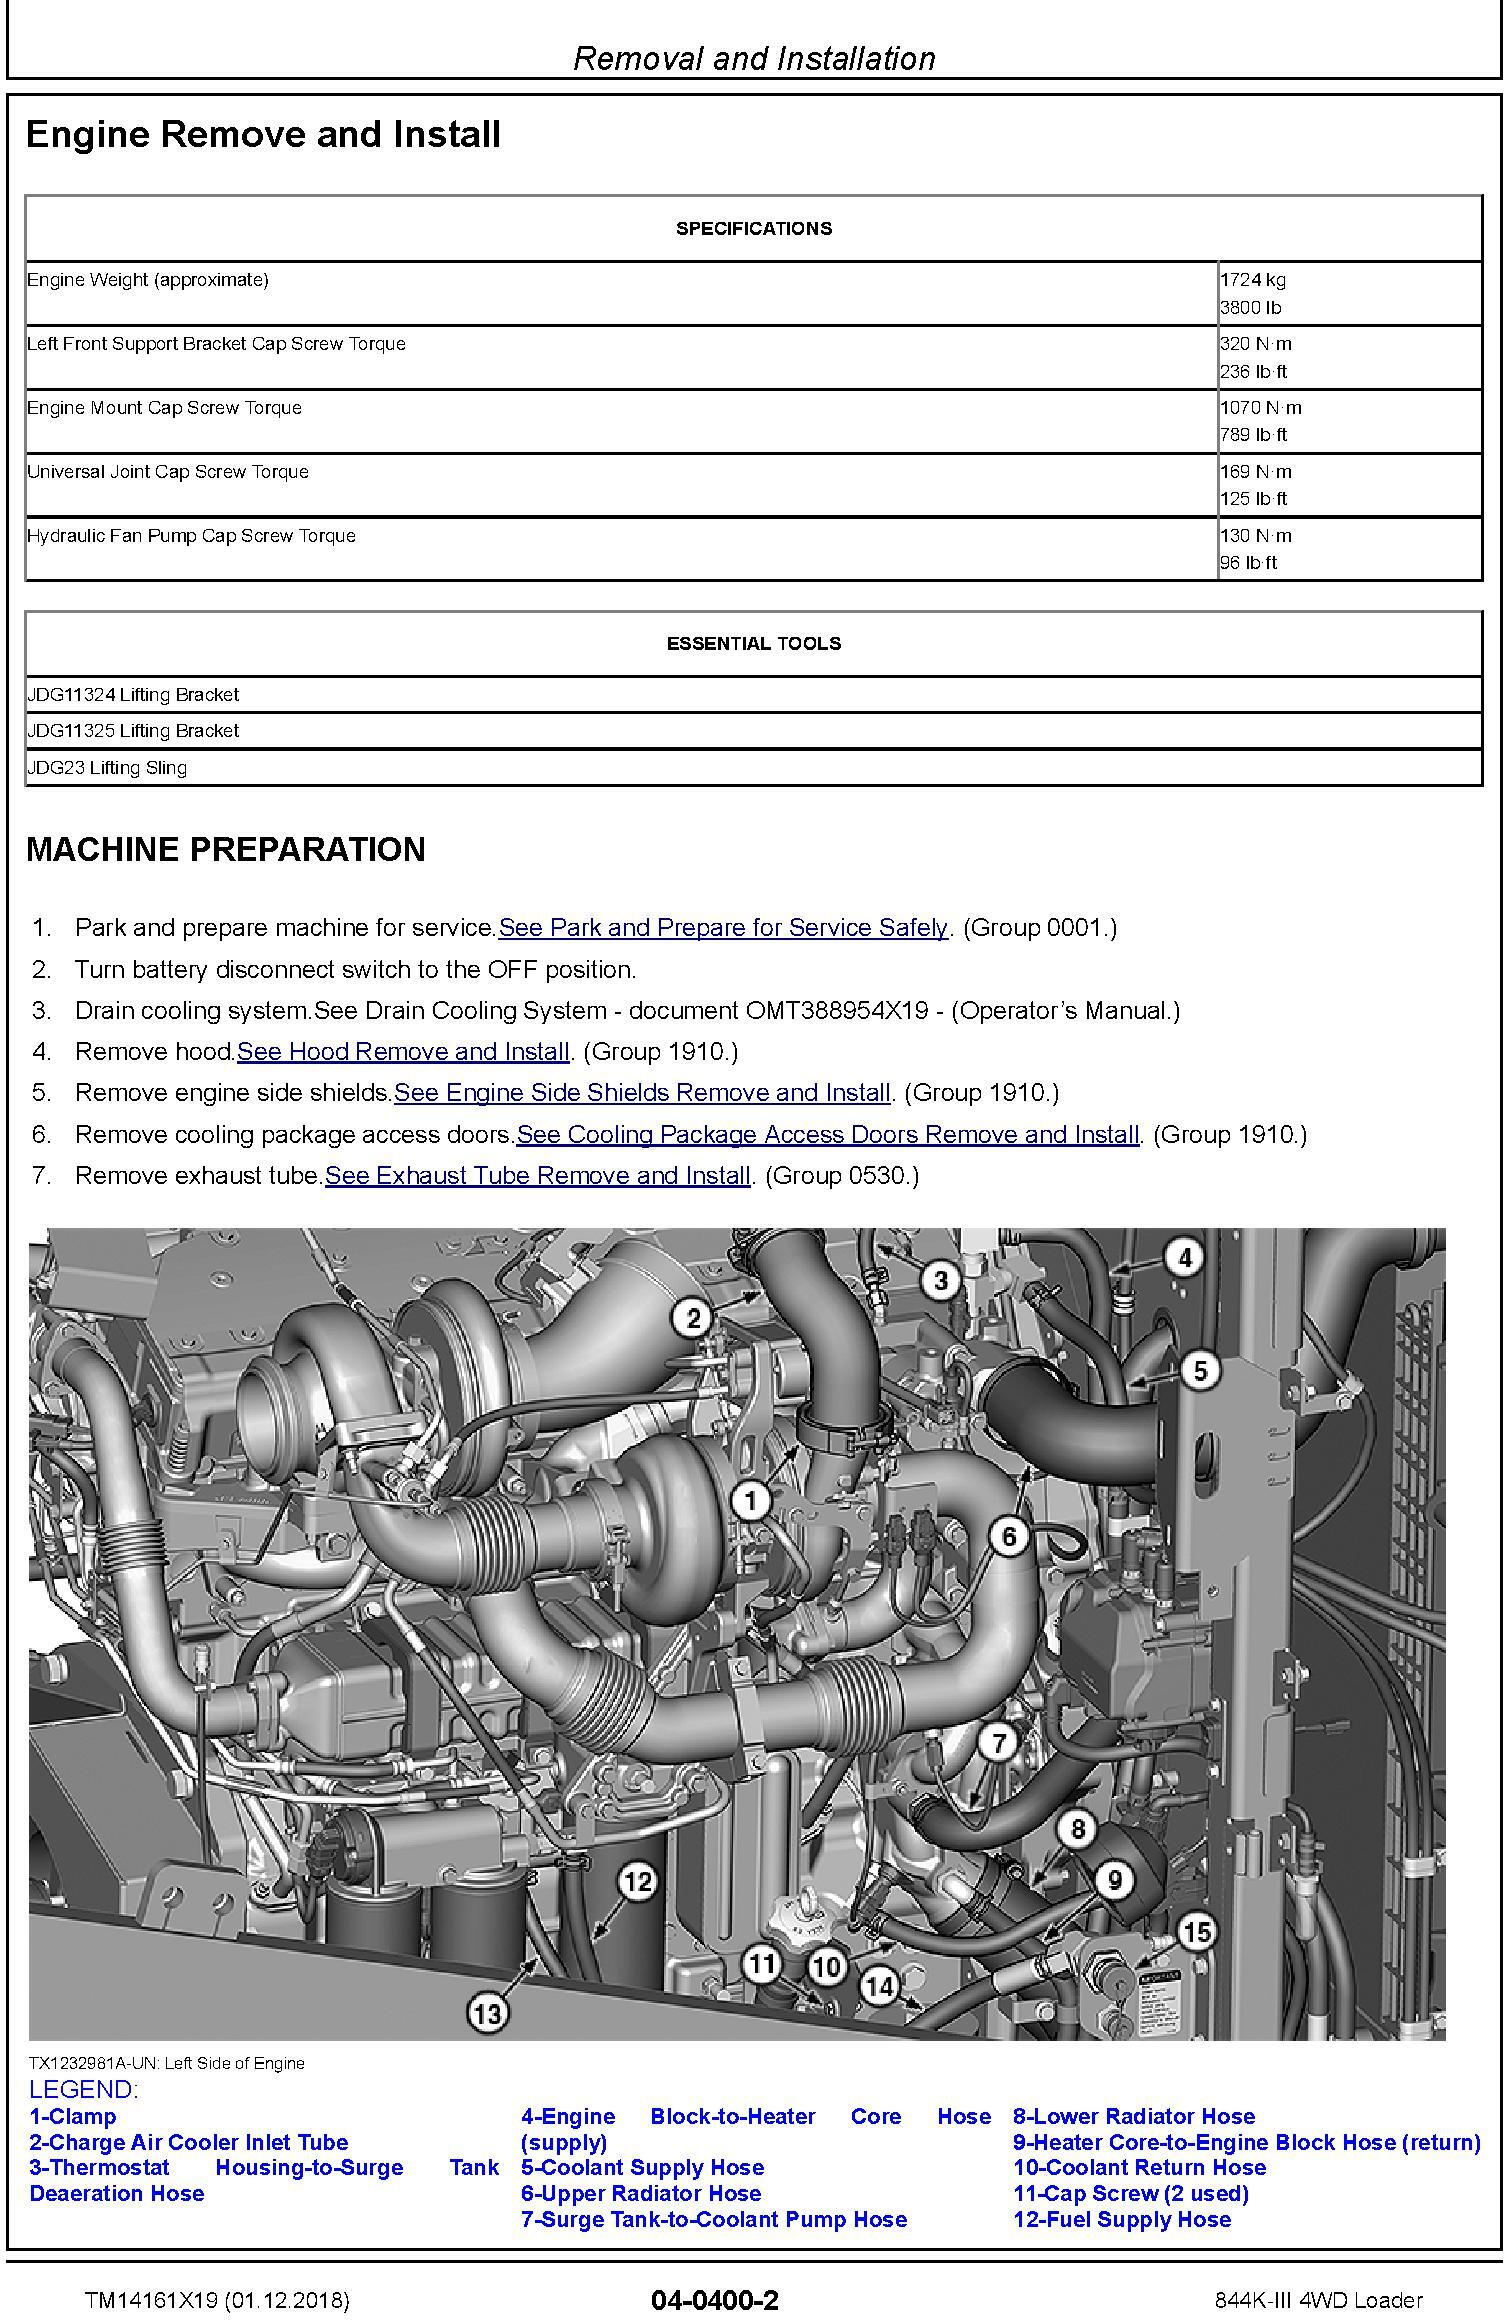 John Deere 844K-III (SN. D677782-) 4WD Loader Repair Technical Service Manual (TM14161X19) - 2